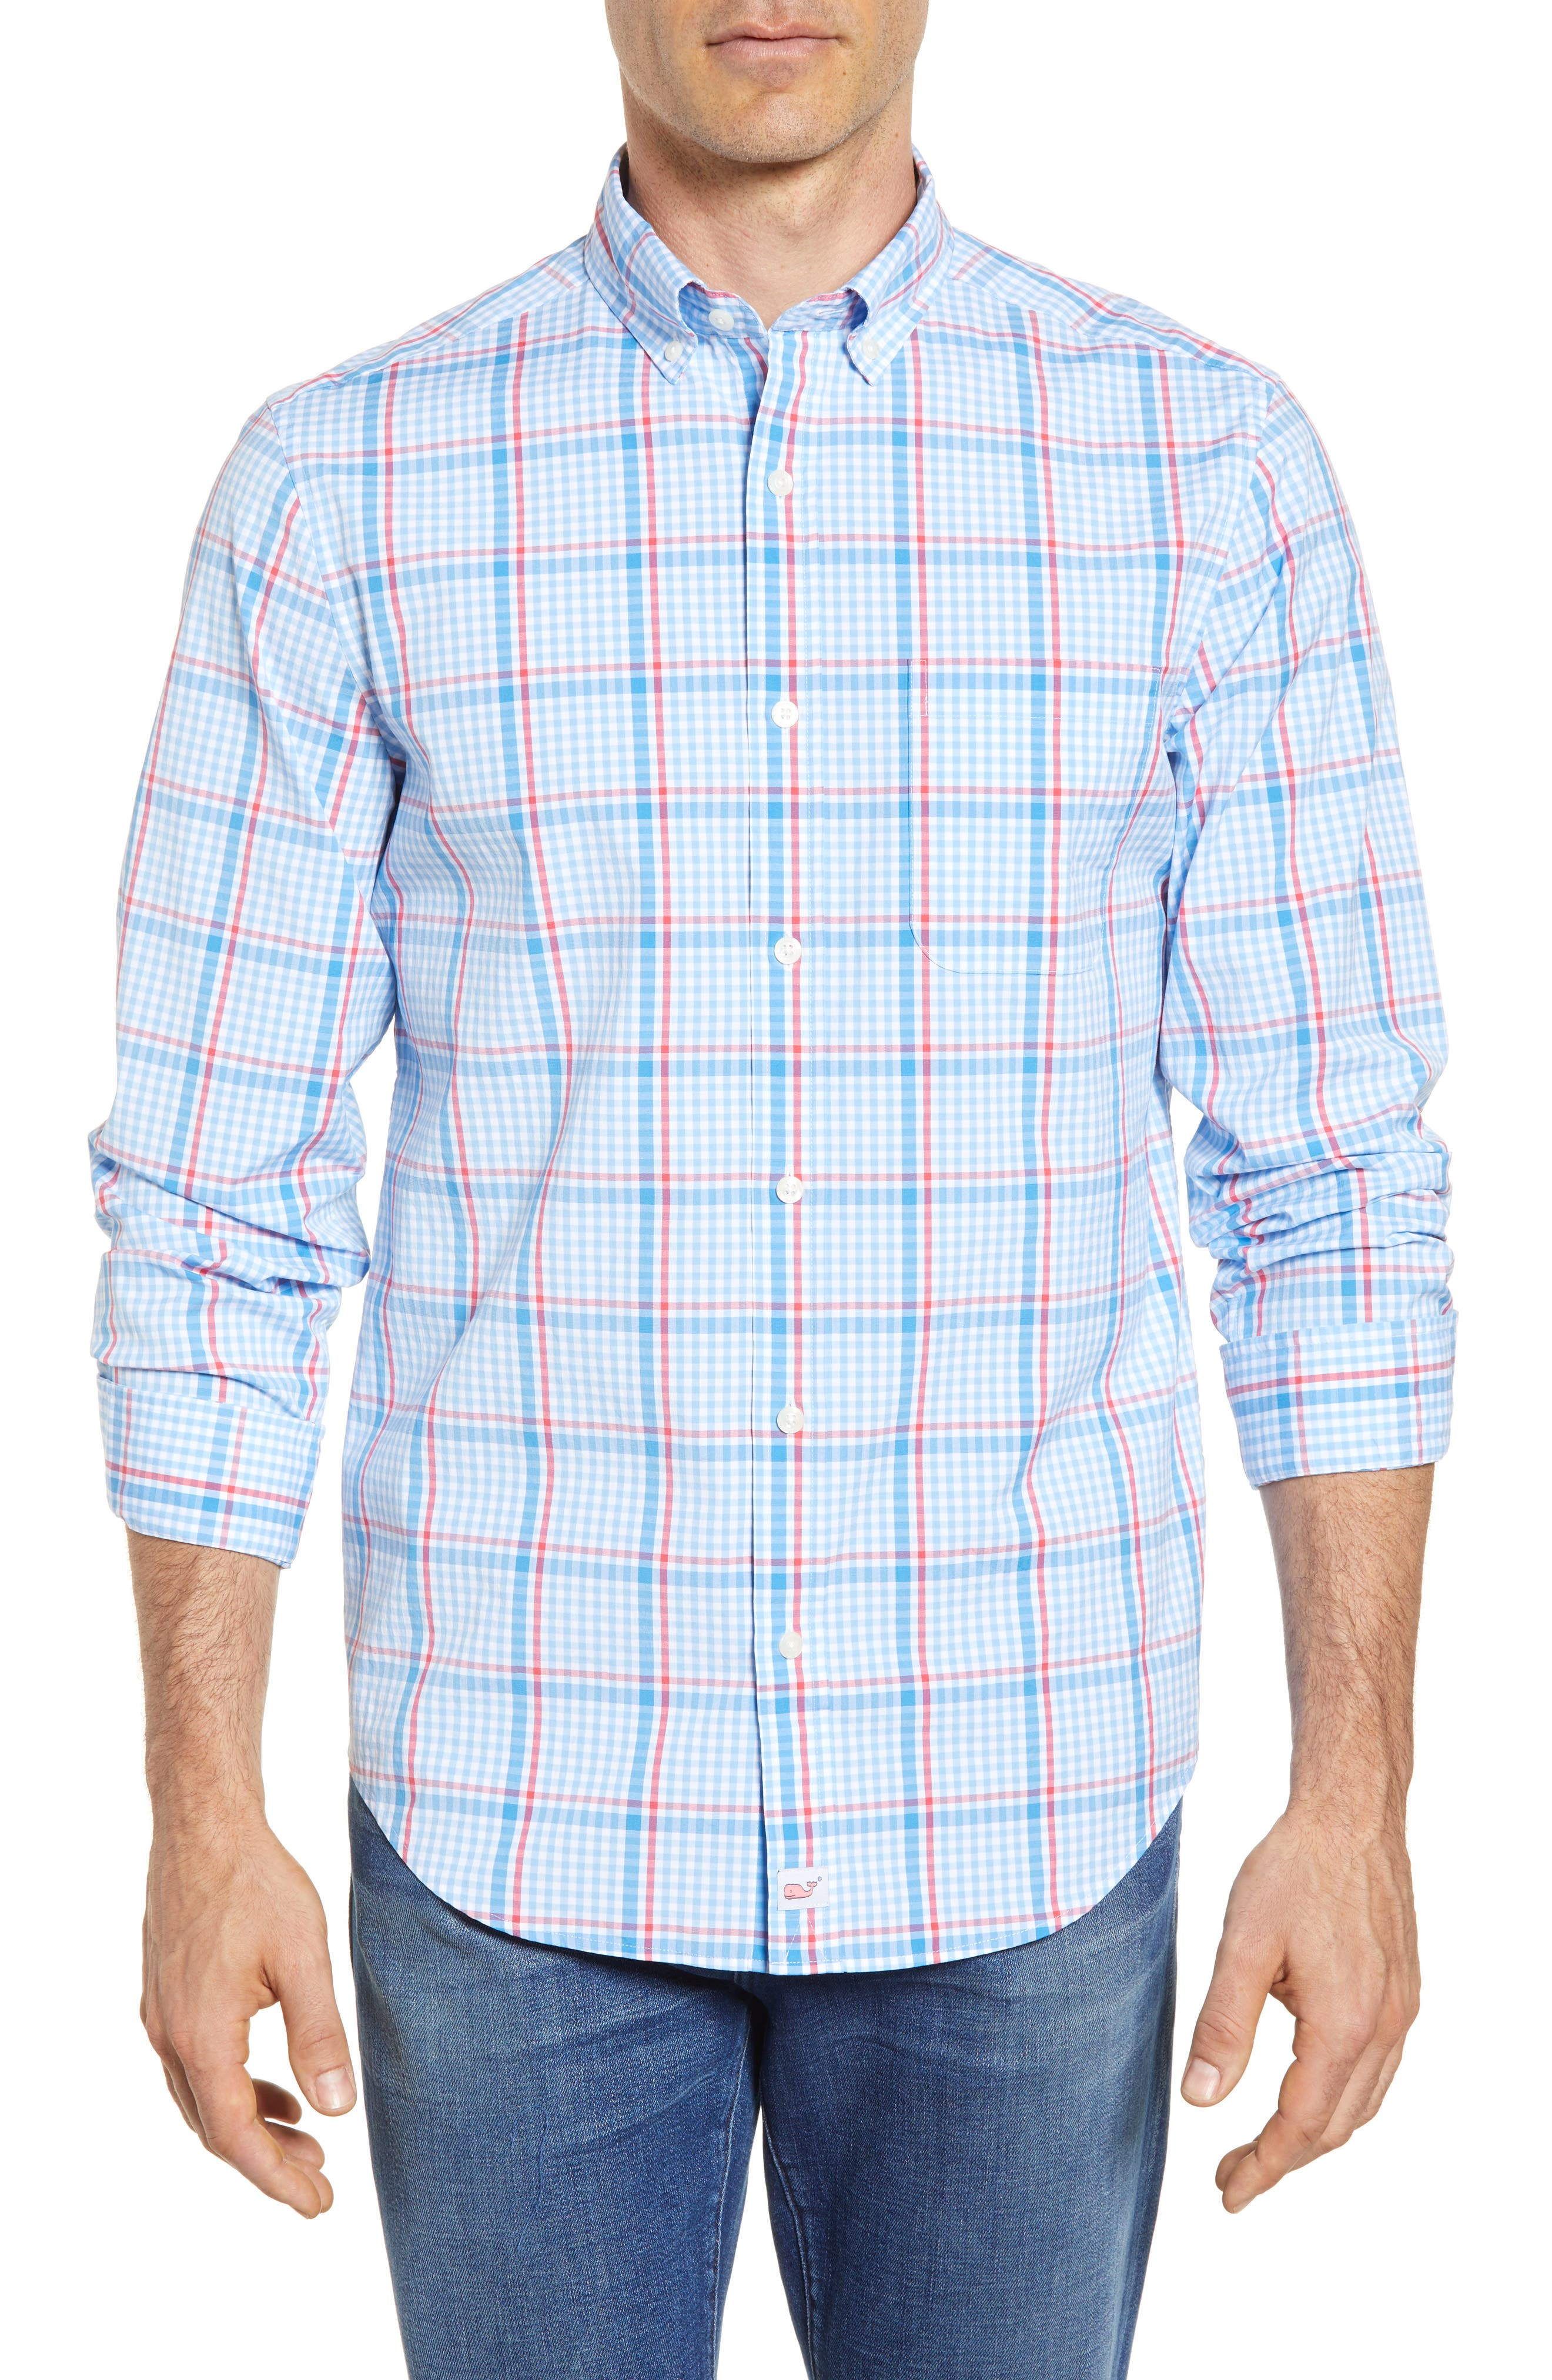 Palmer Island Classic Fit Plaid Sport Shirt,                         Main,                         color, 484